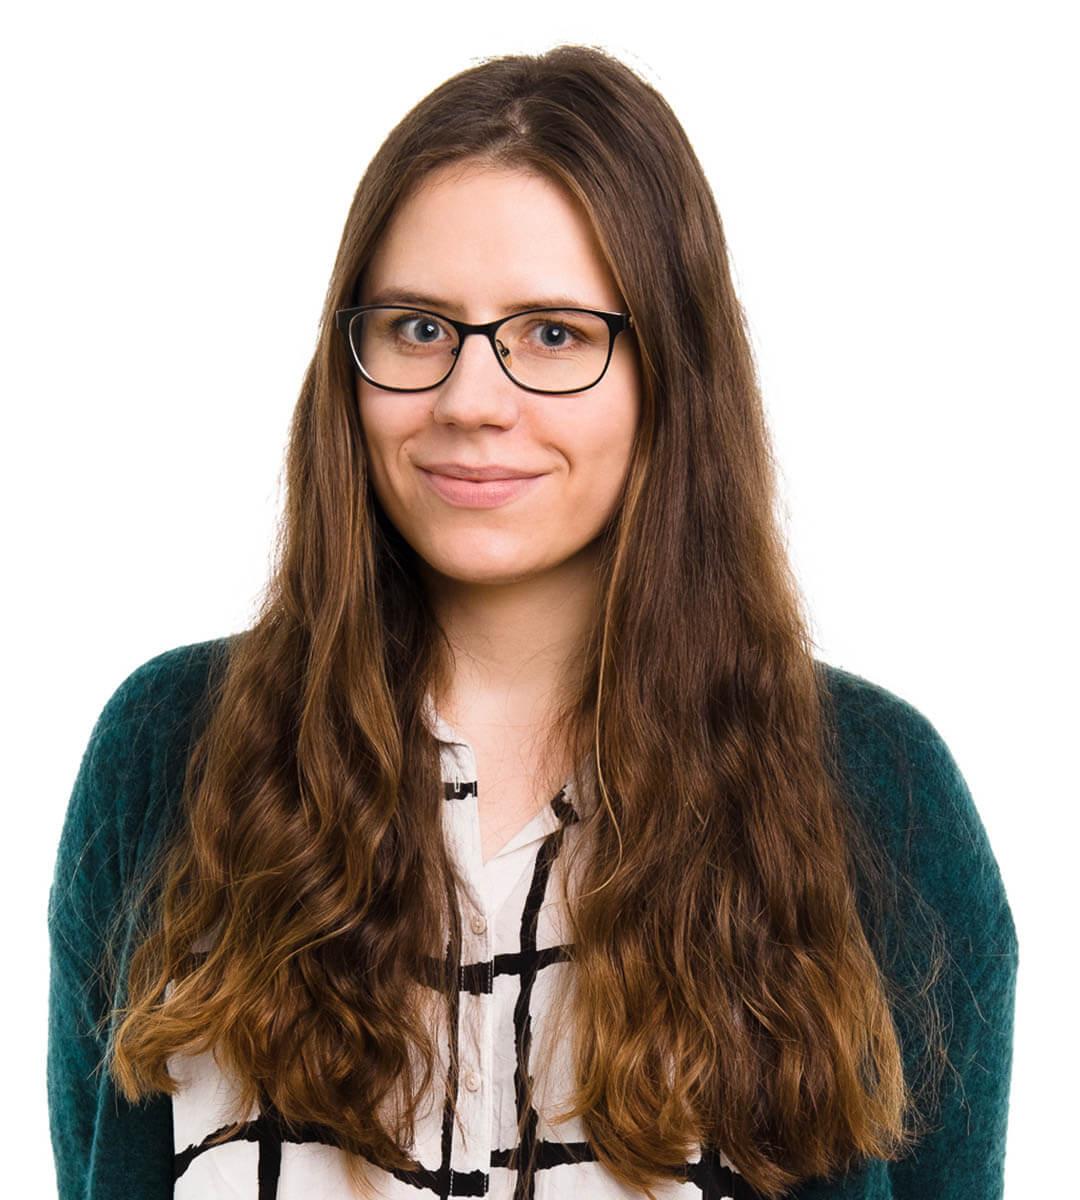 Magdalena Fedorczuk